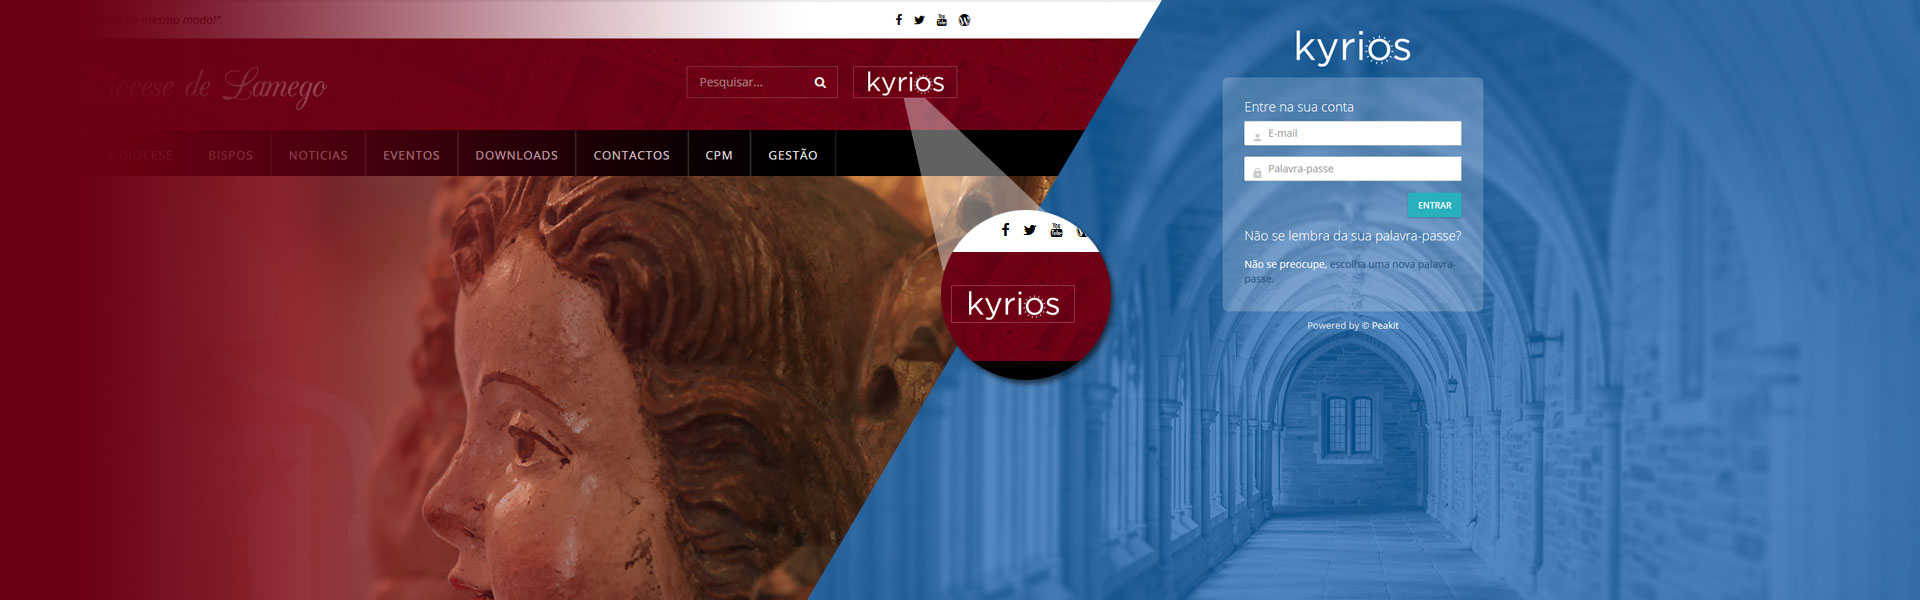 kyrios-diocese-lamego